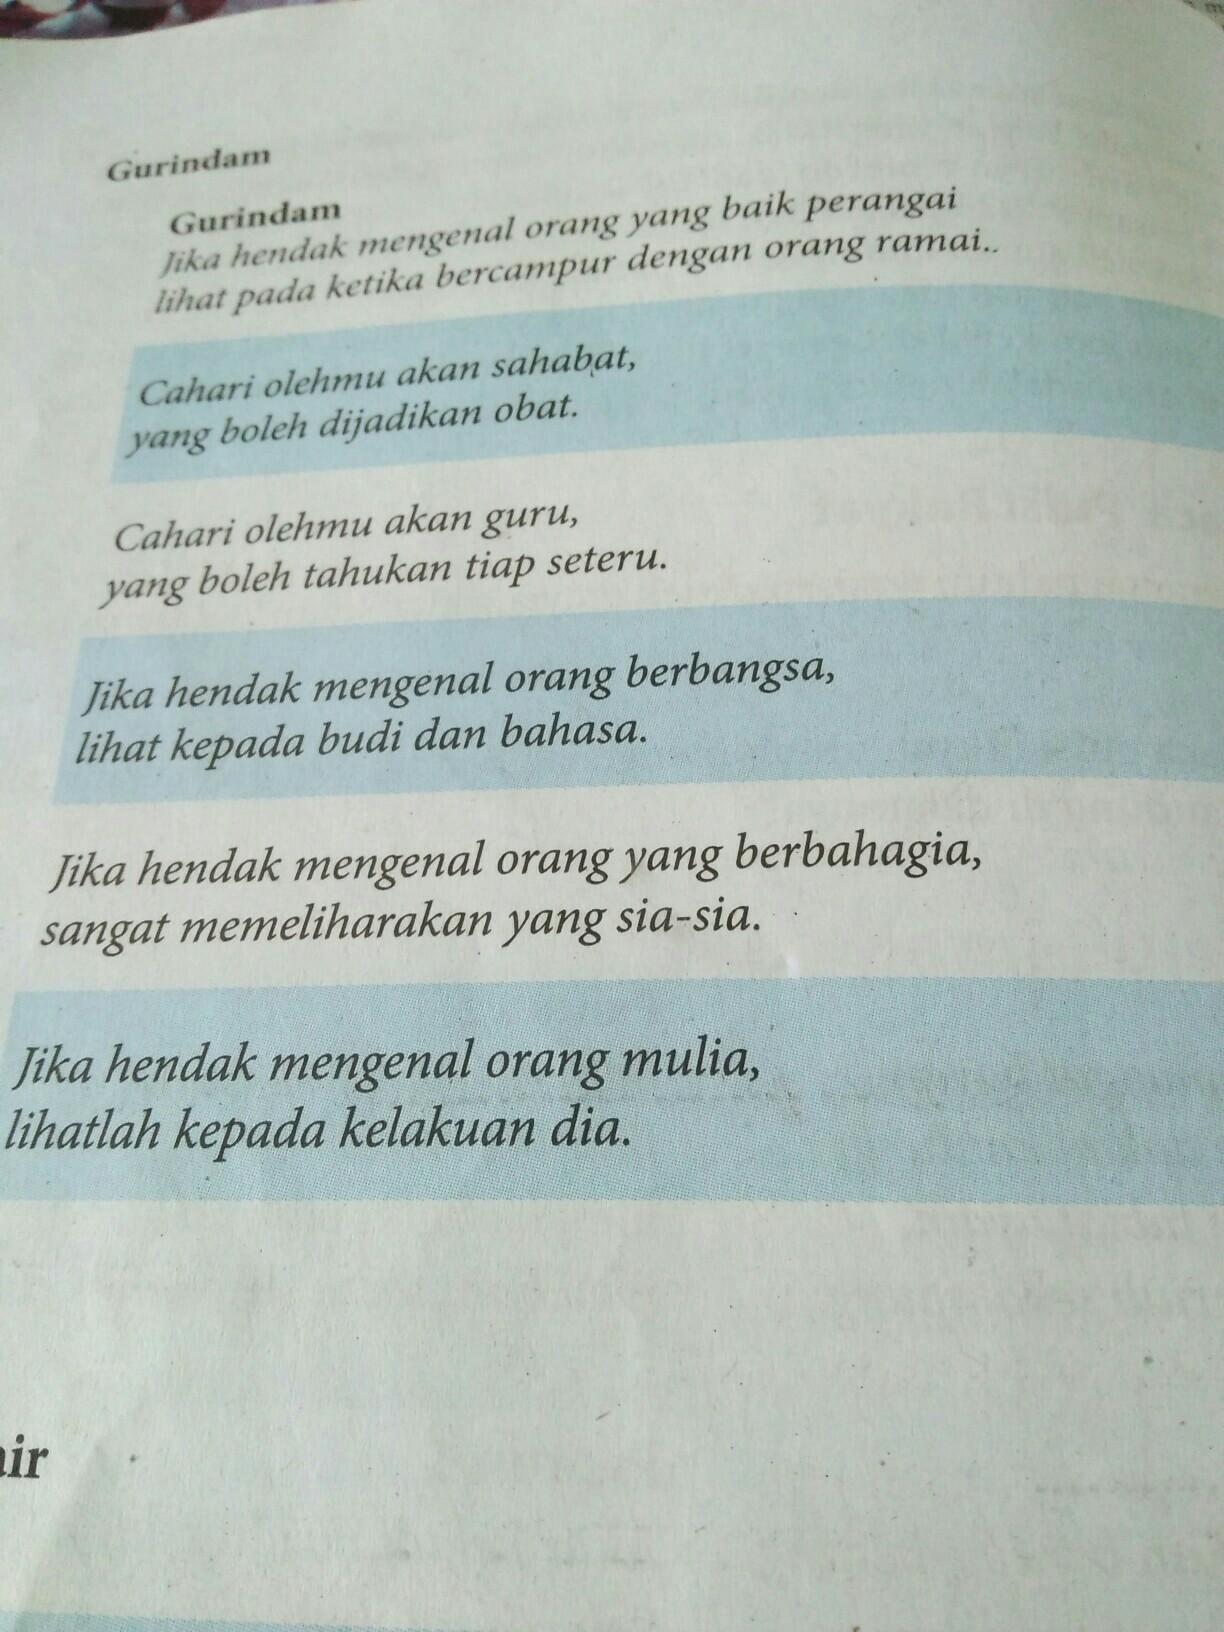 Gurindam Sahabat : gurindam, sahabat, Buatin, Pantun, Gurindam, Syair, Plisss, Brainly.co.id